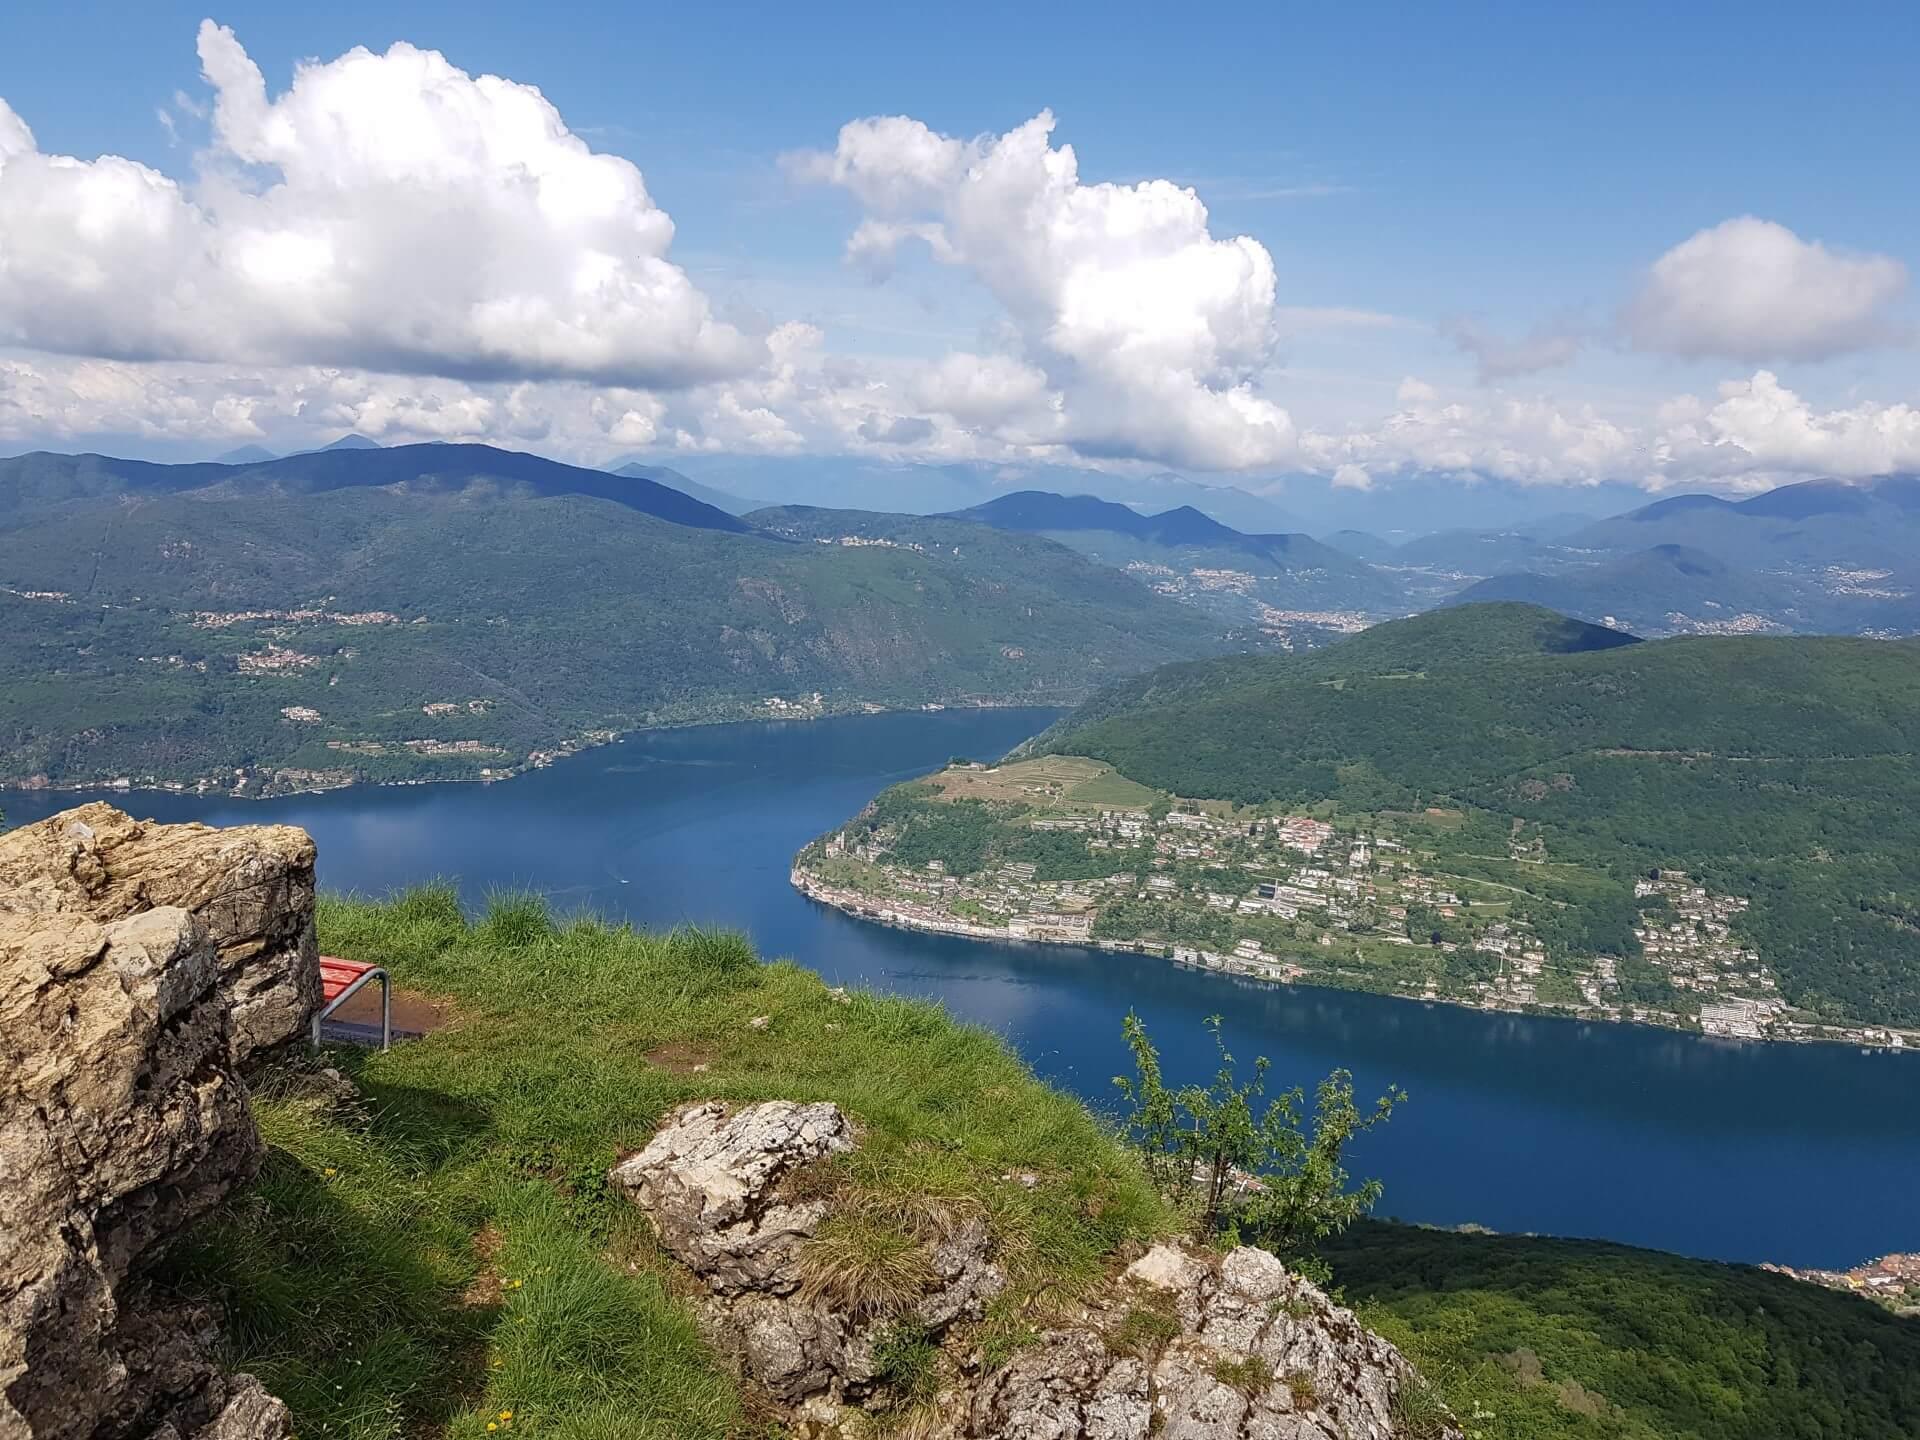 Dolceresio Lugano Lake B&B, Brusino Arsizio - Activities and Surroundings - Vista Morcote dal San Giorgio